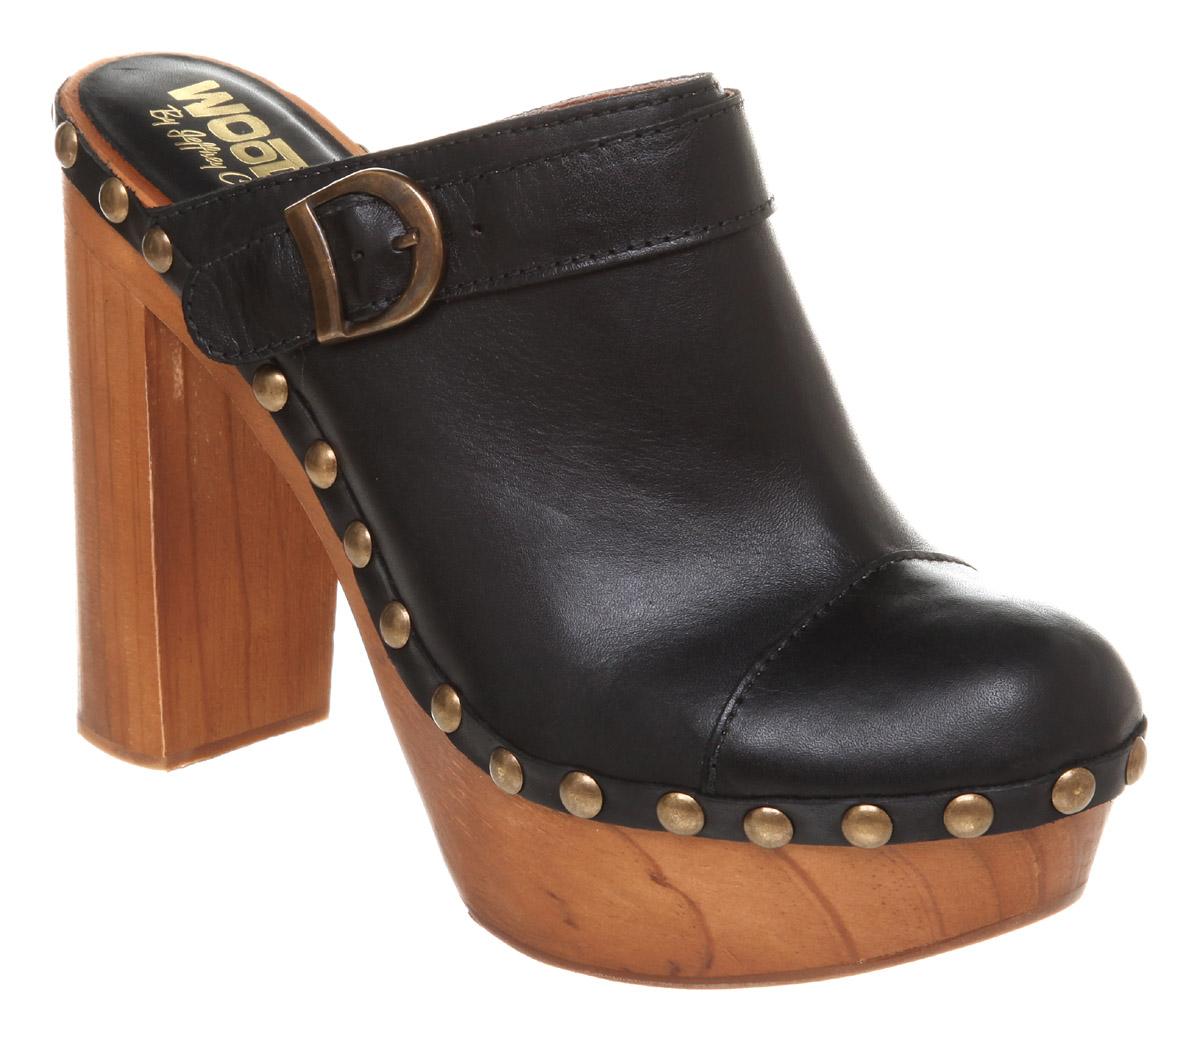 ecb273d422 Jeffrey Campbell Charlie Heeled Clog Black Leather